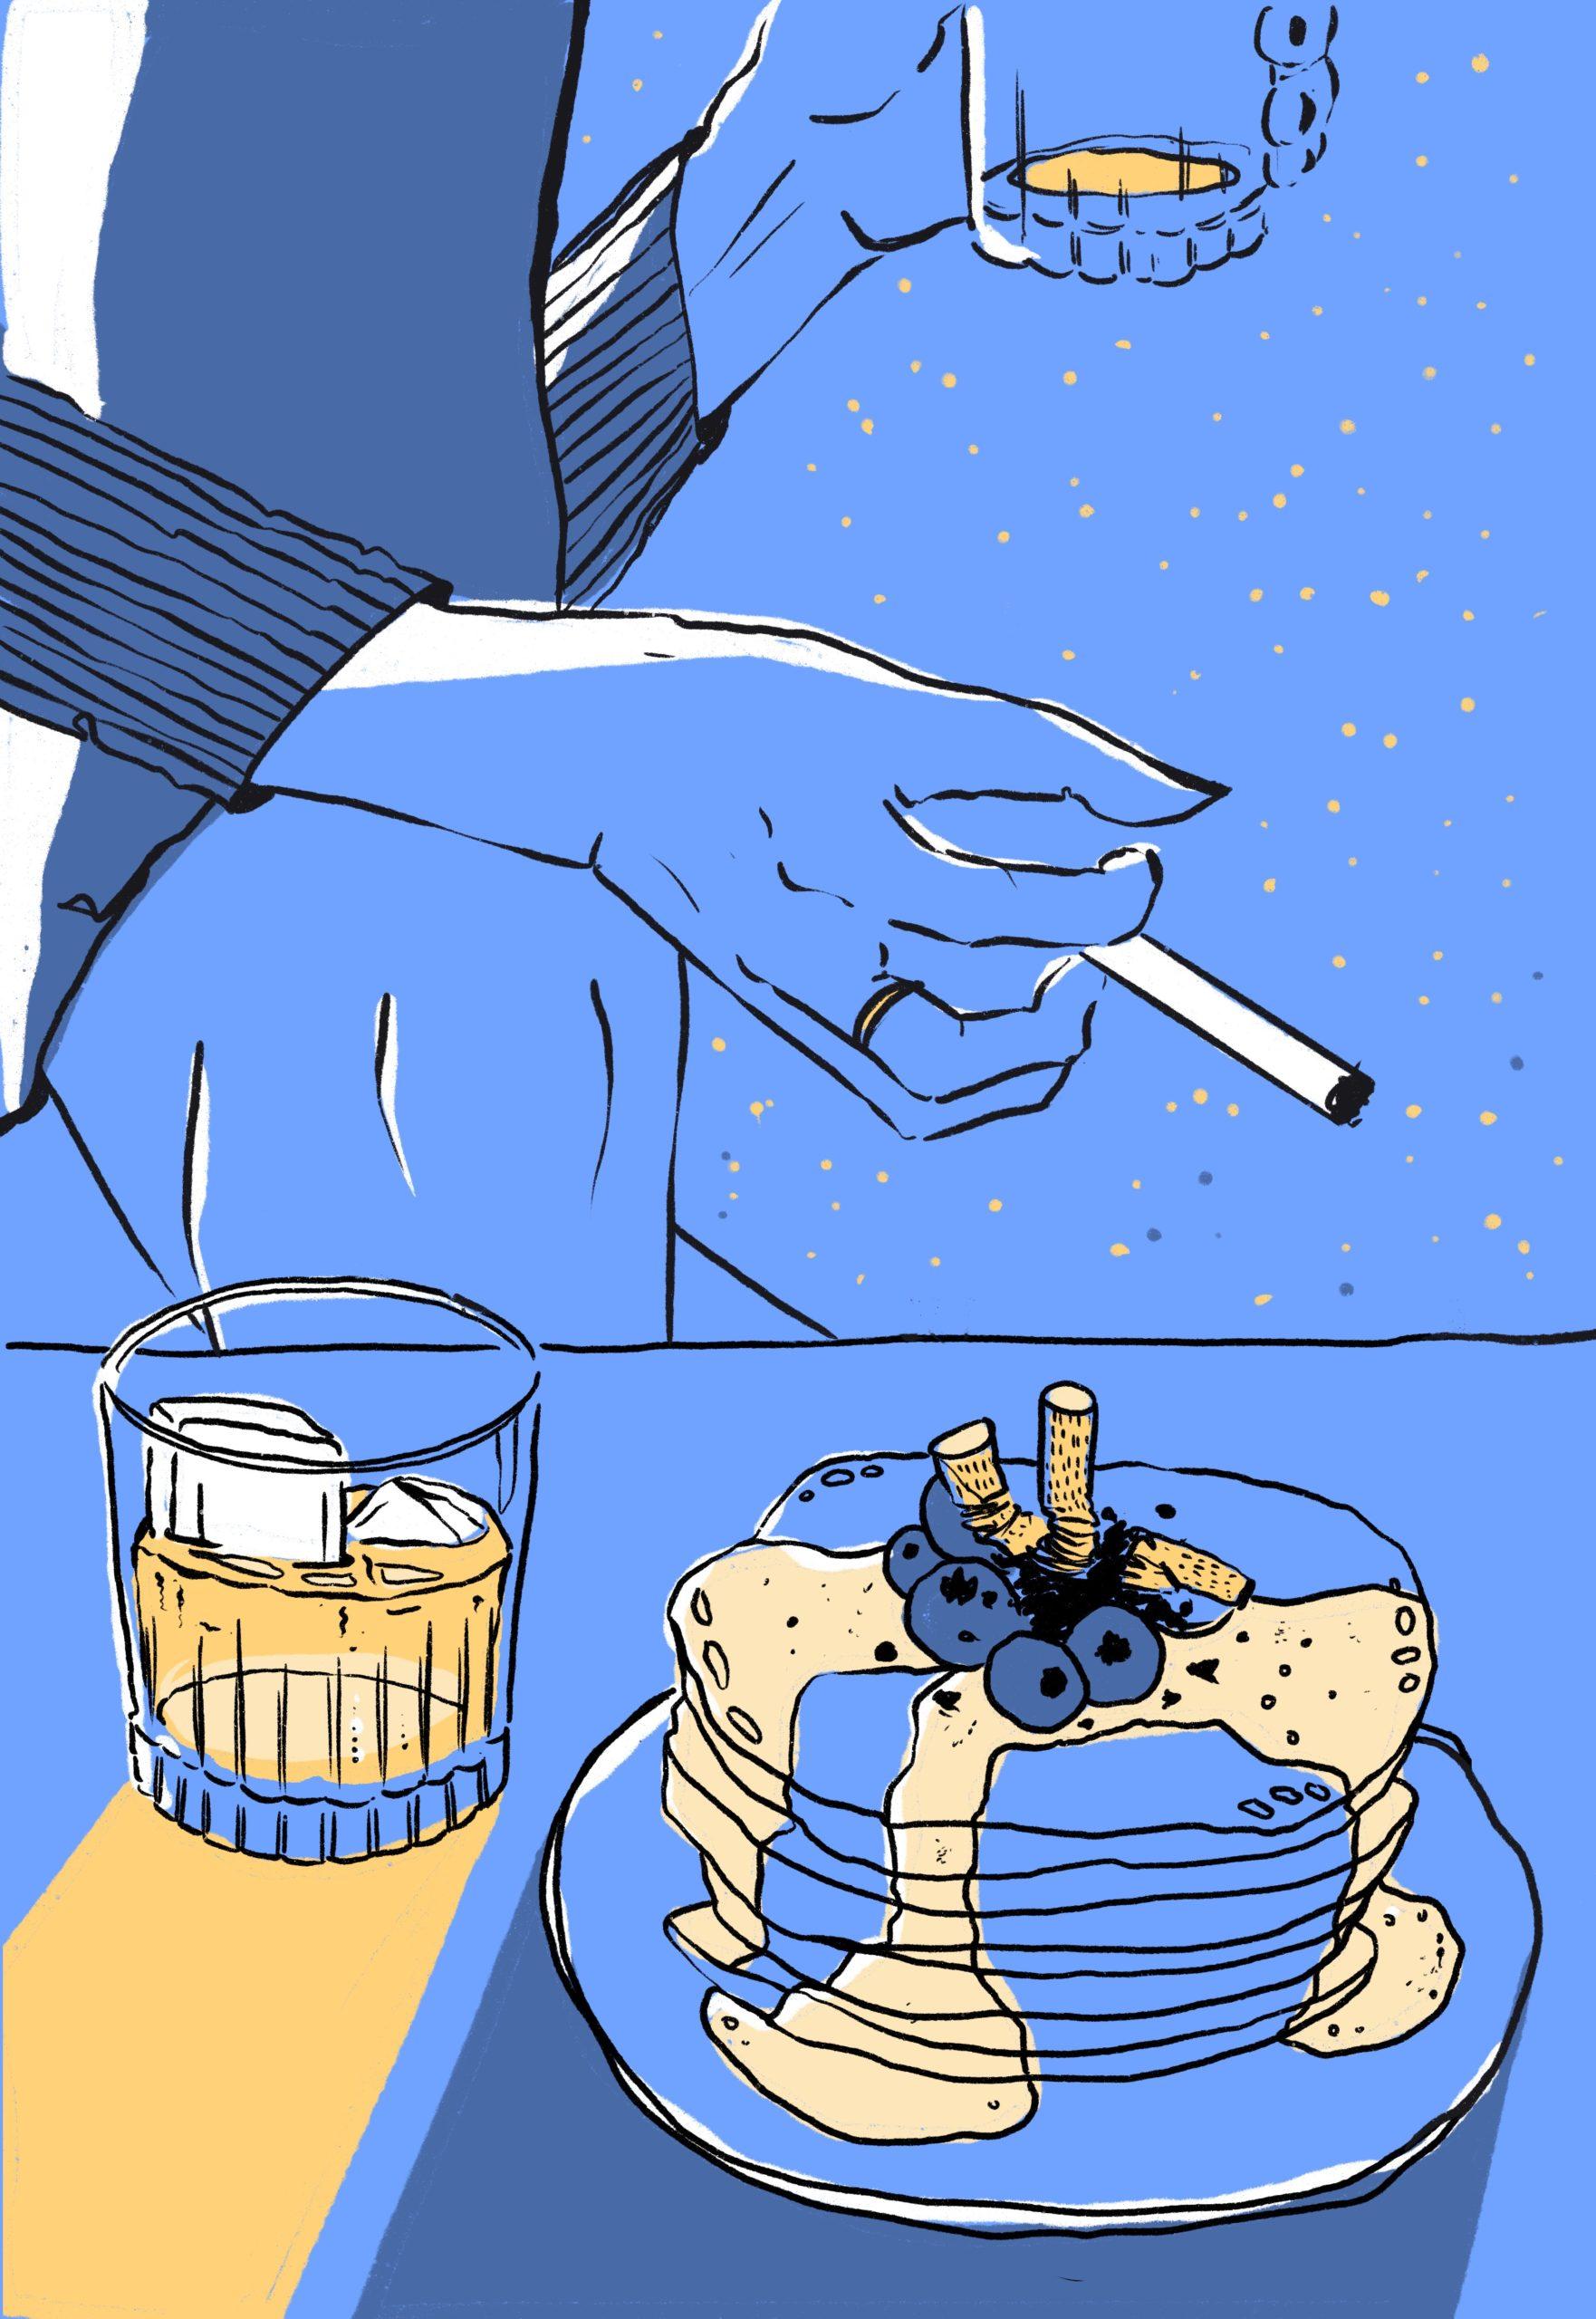 Illustration Procreate Outline Schwarz Blau Gelb Pancakes Cigarette Zigaretten Melancholy Hand Alkohol